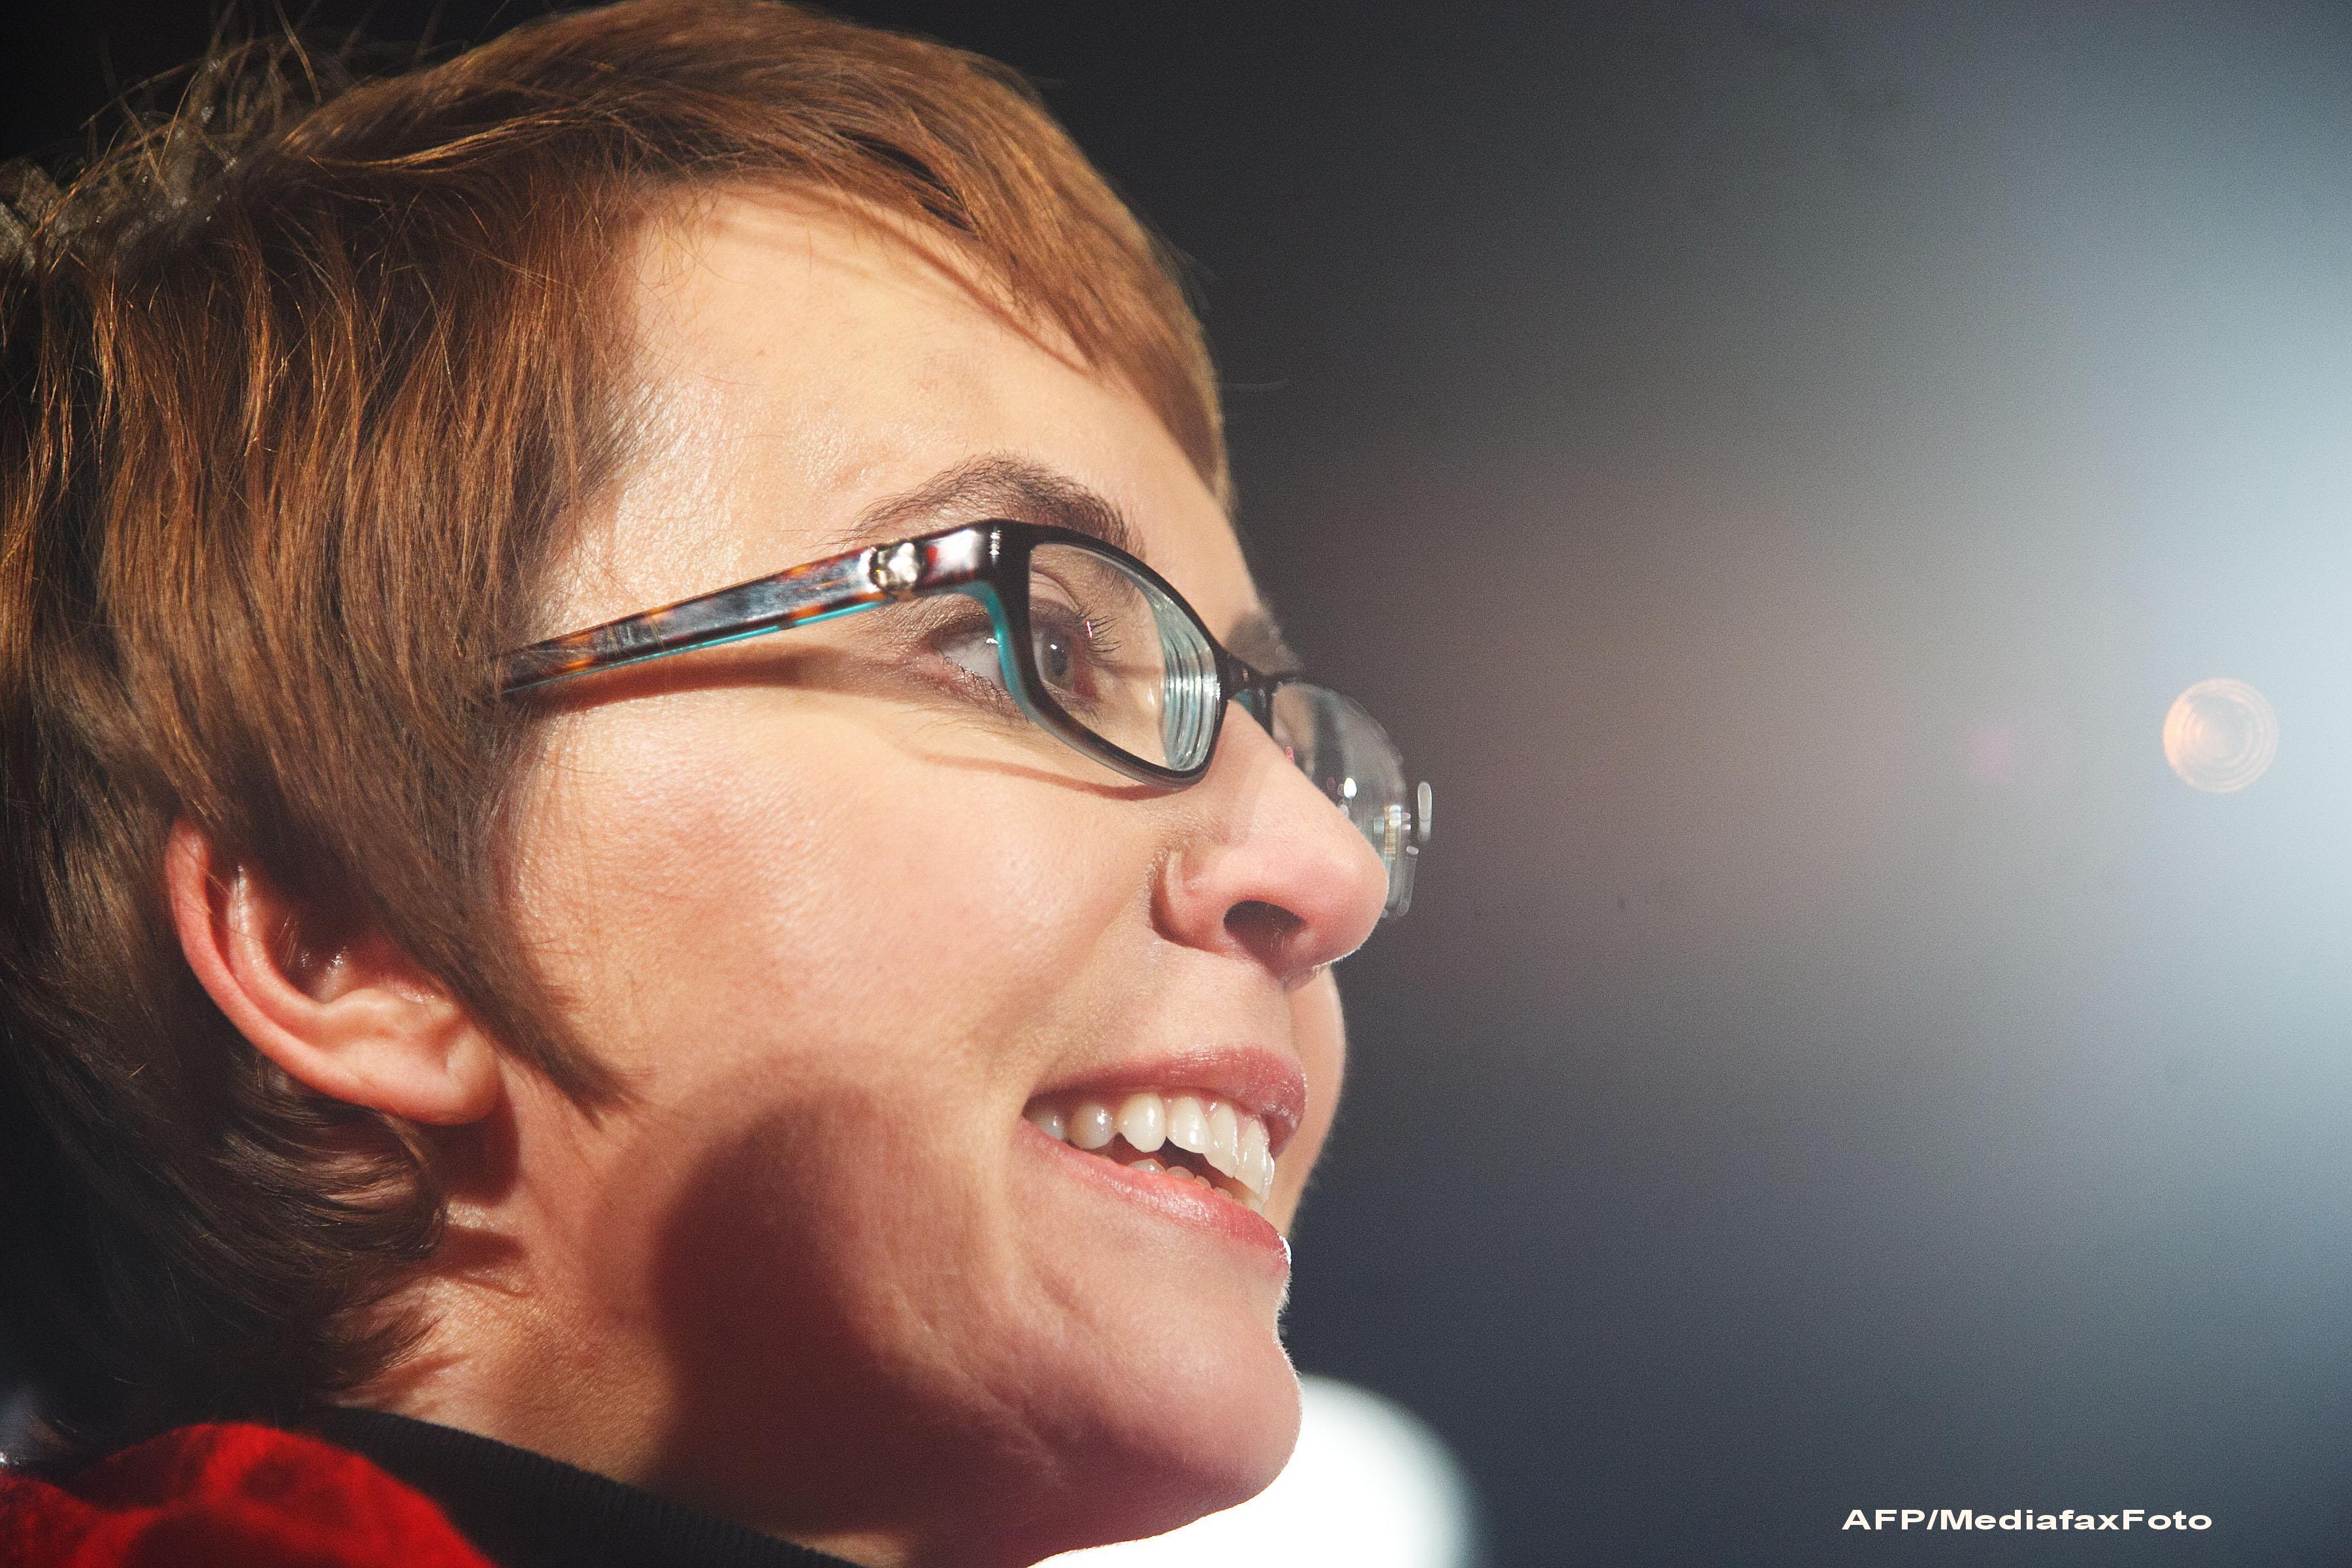 La un an dupa ce a fost impuscata in cap, Gabrielle Giffords se retrage din Congresul SUA